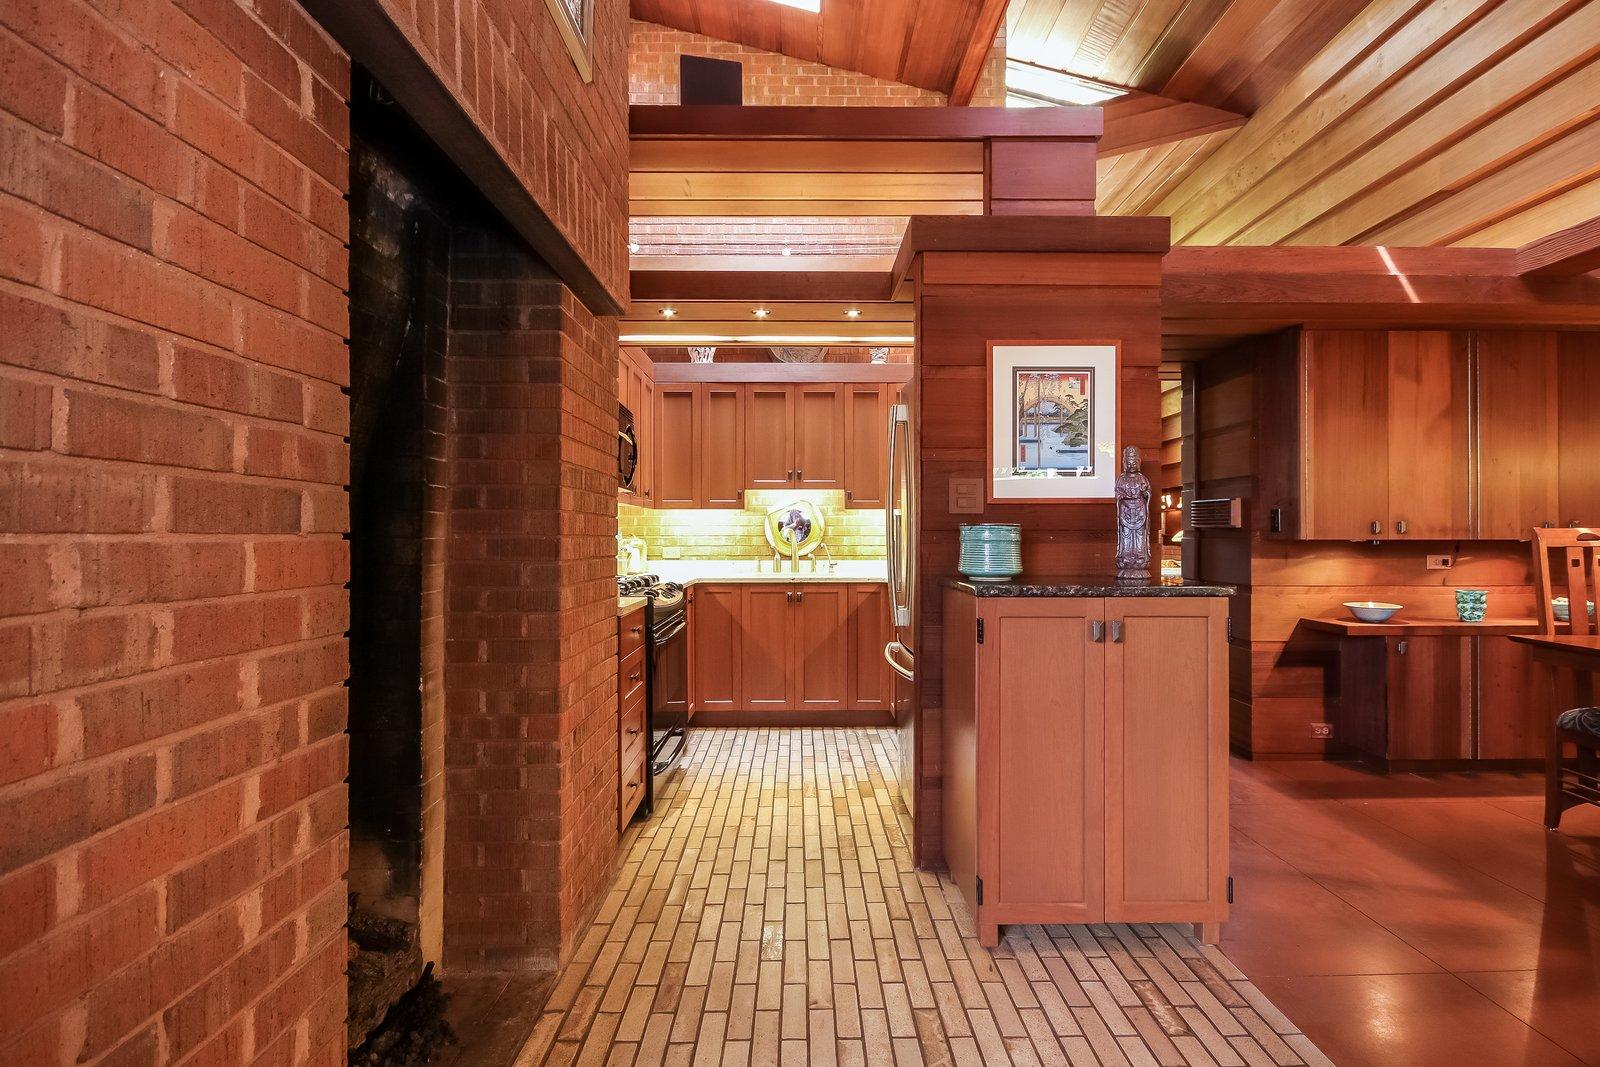 Kitchen  Frank Lloyd Wright's Small Masterpiece: The Haddock House